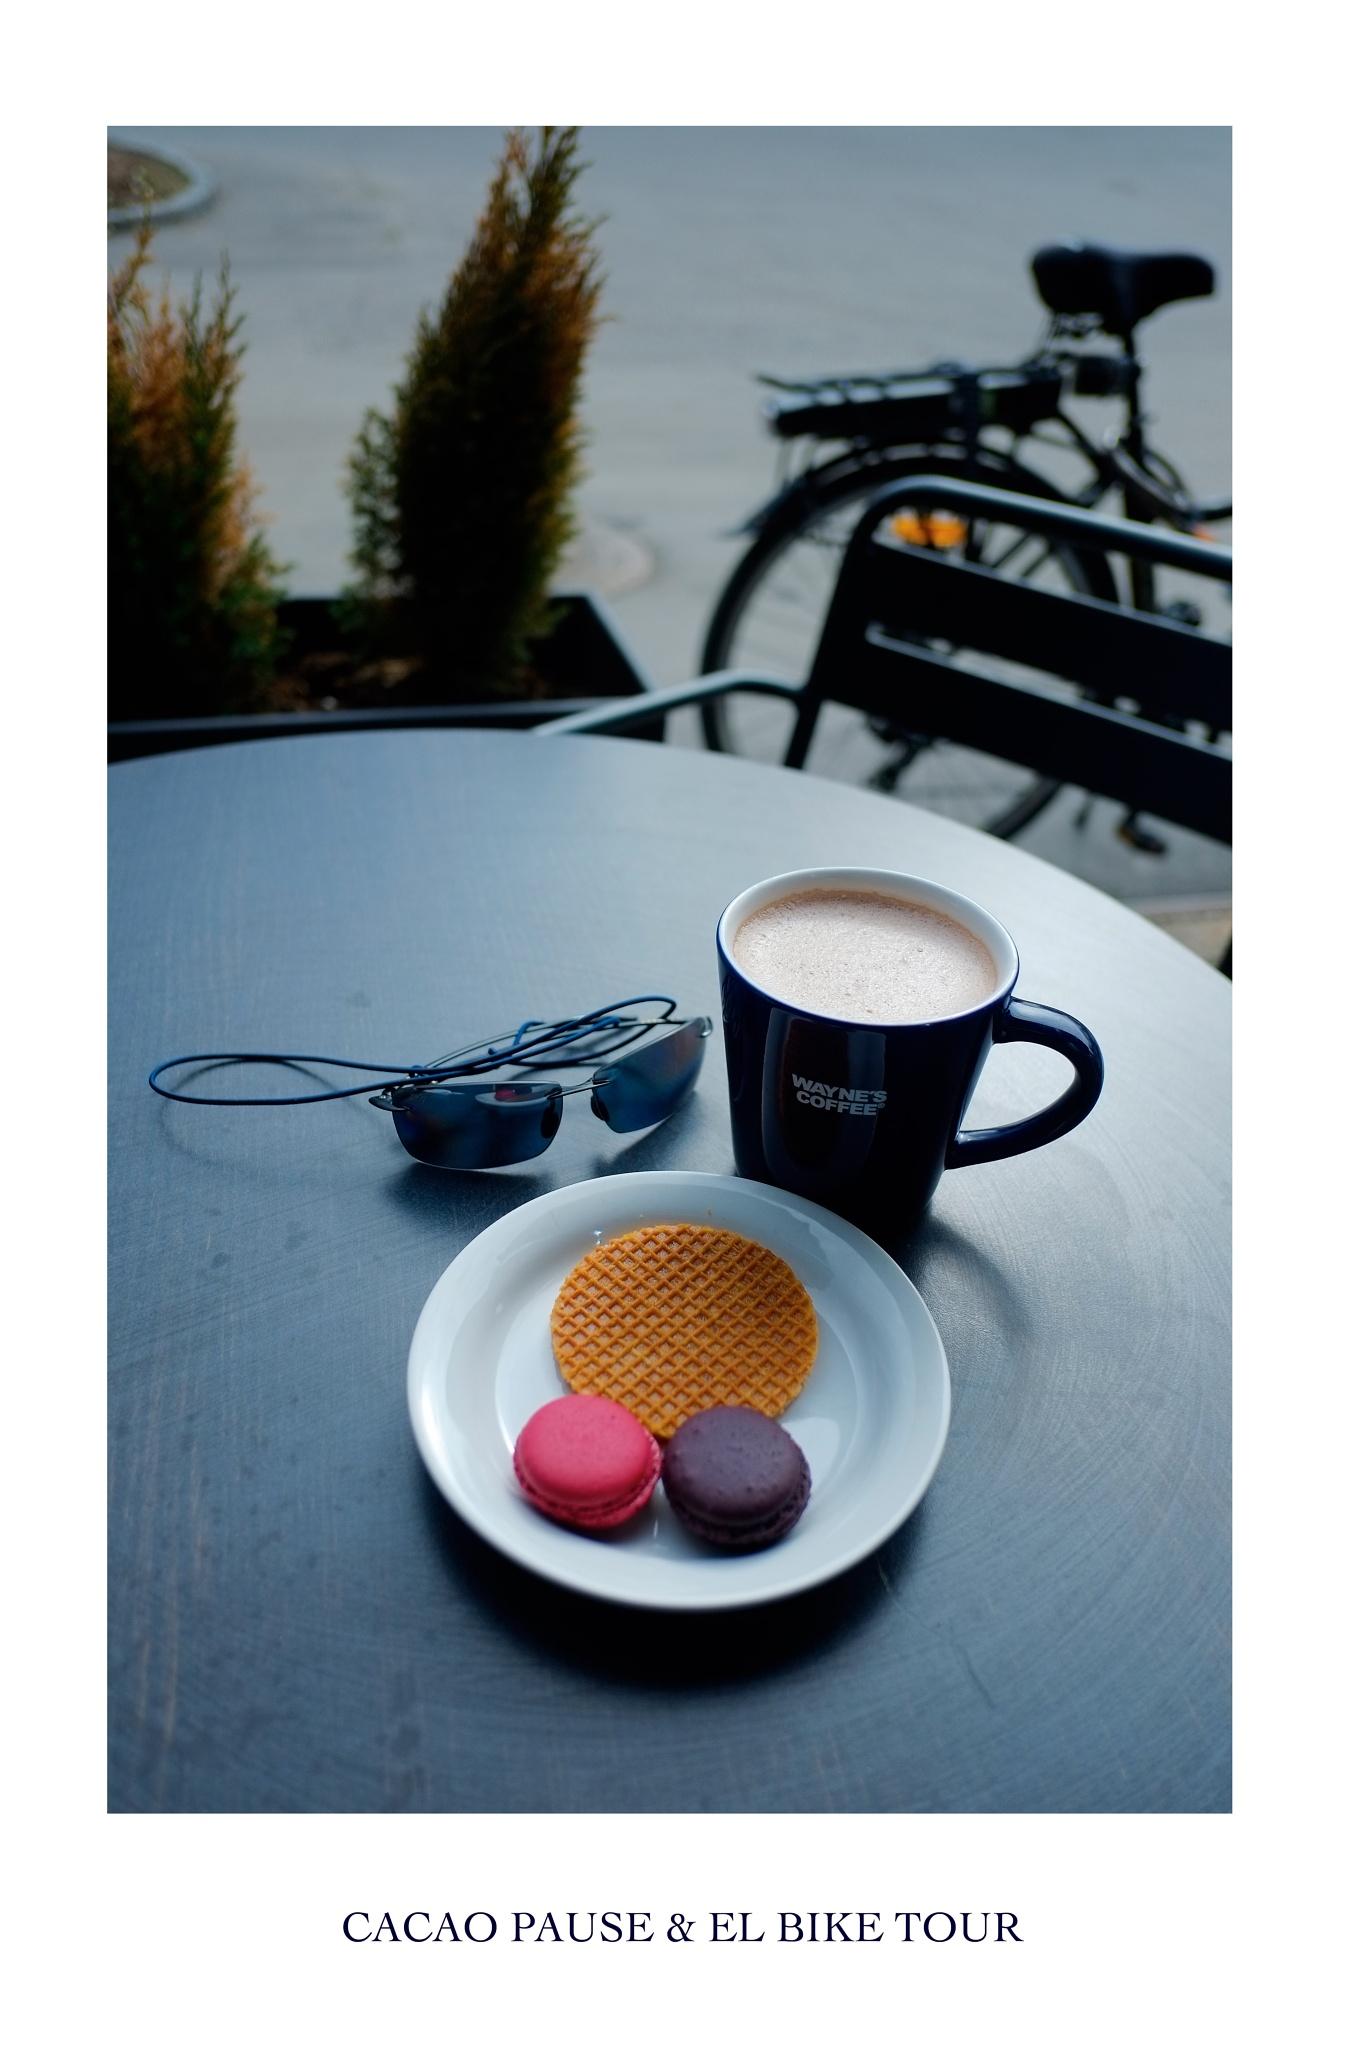 Cacao Pause & El Bike Tour by Goran Jorganovich